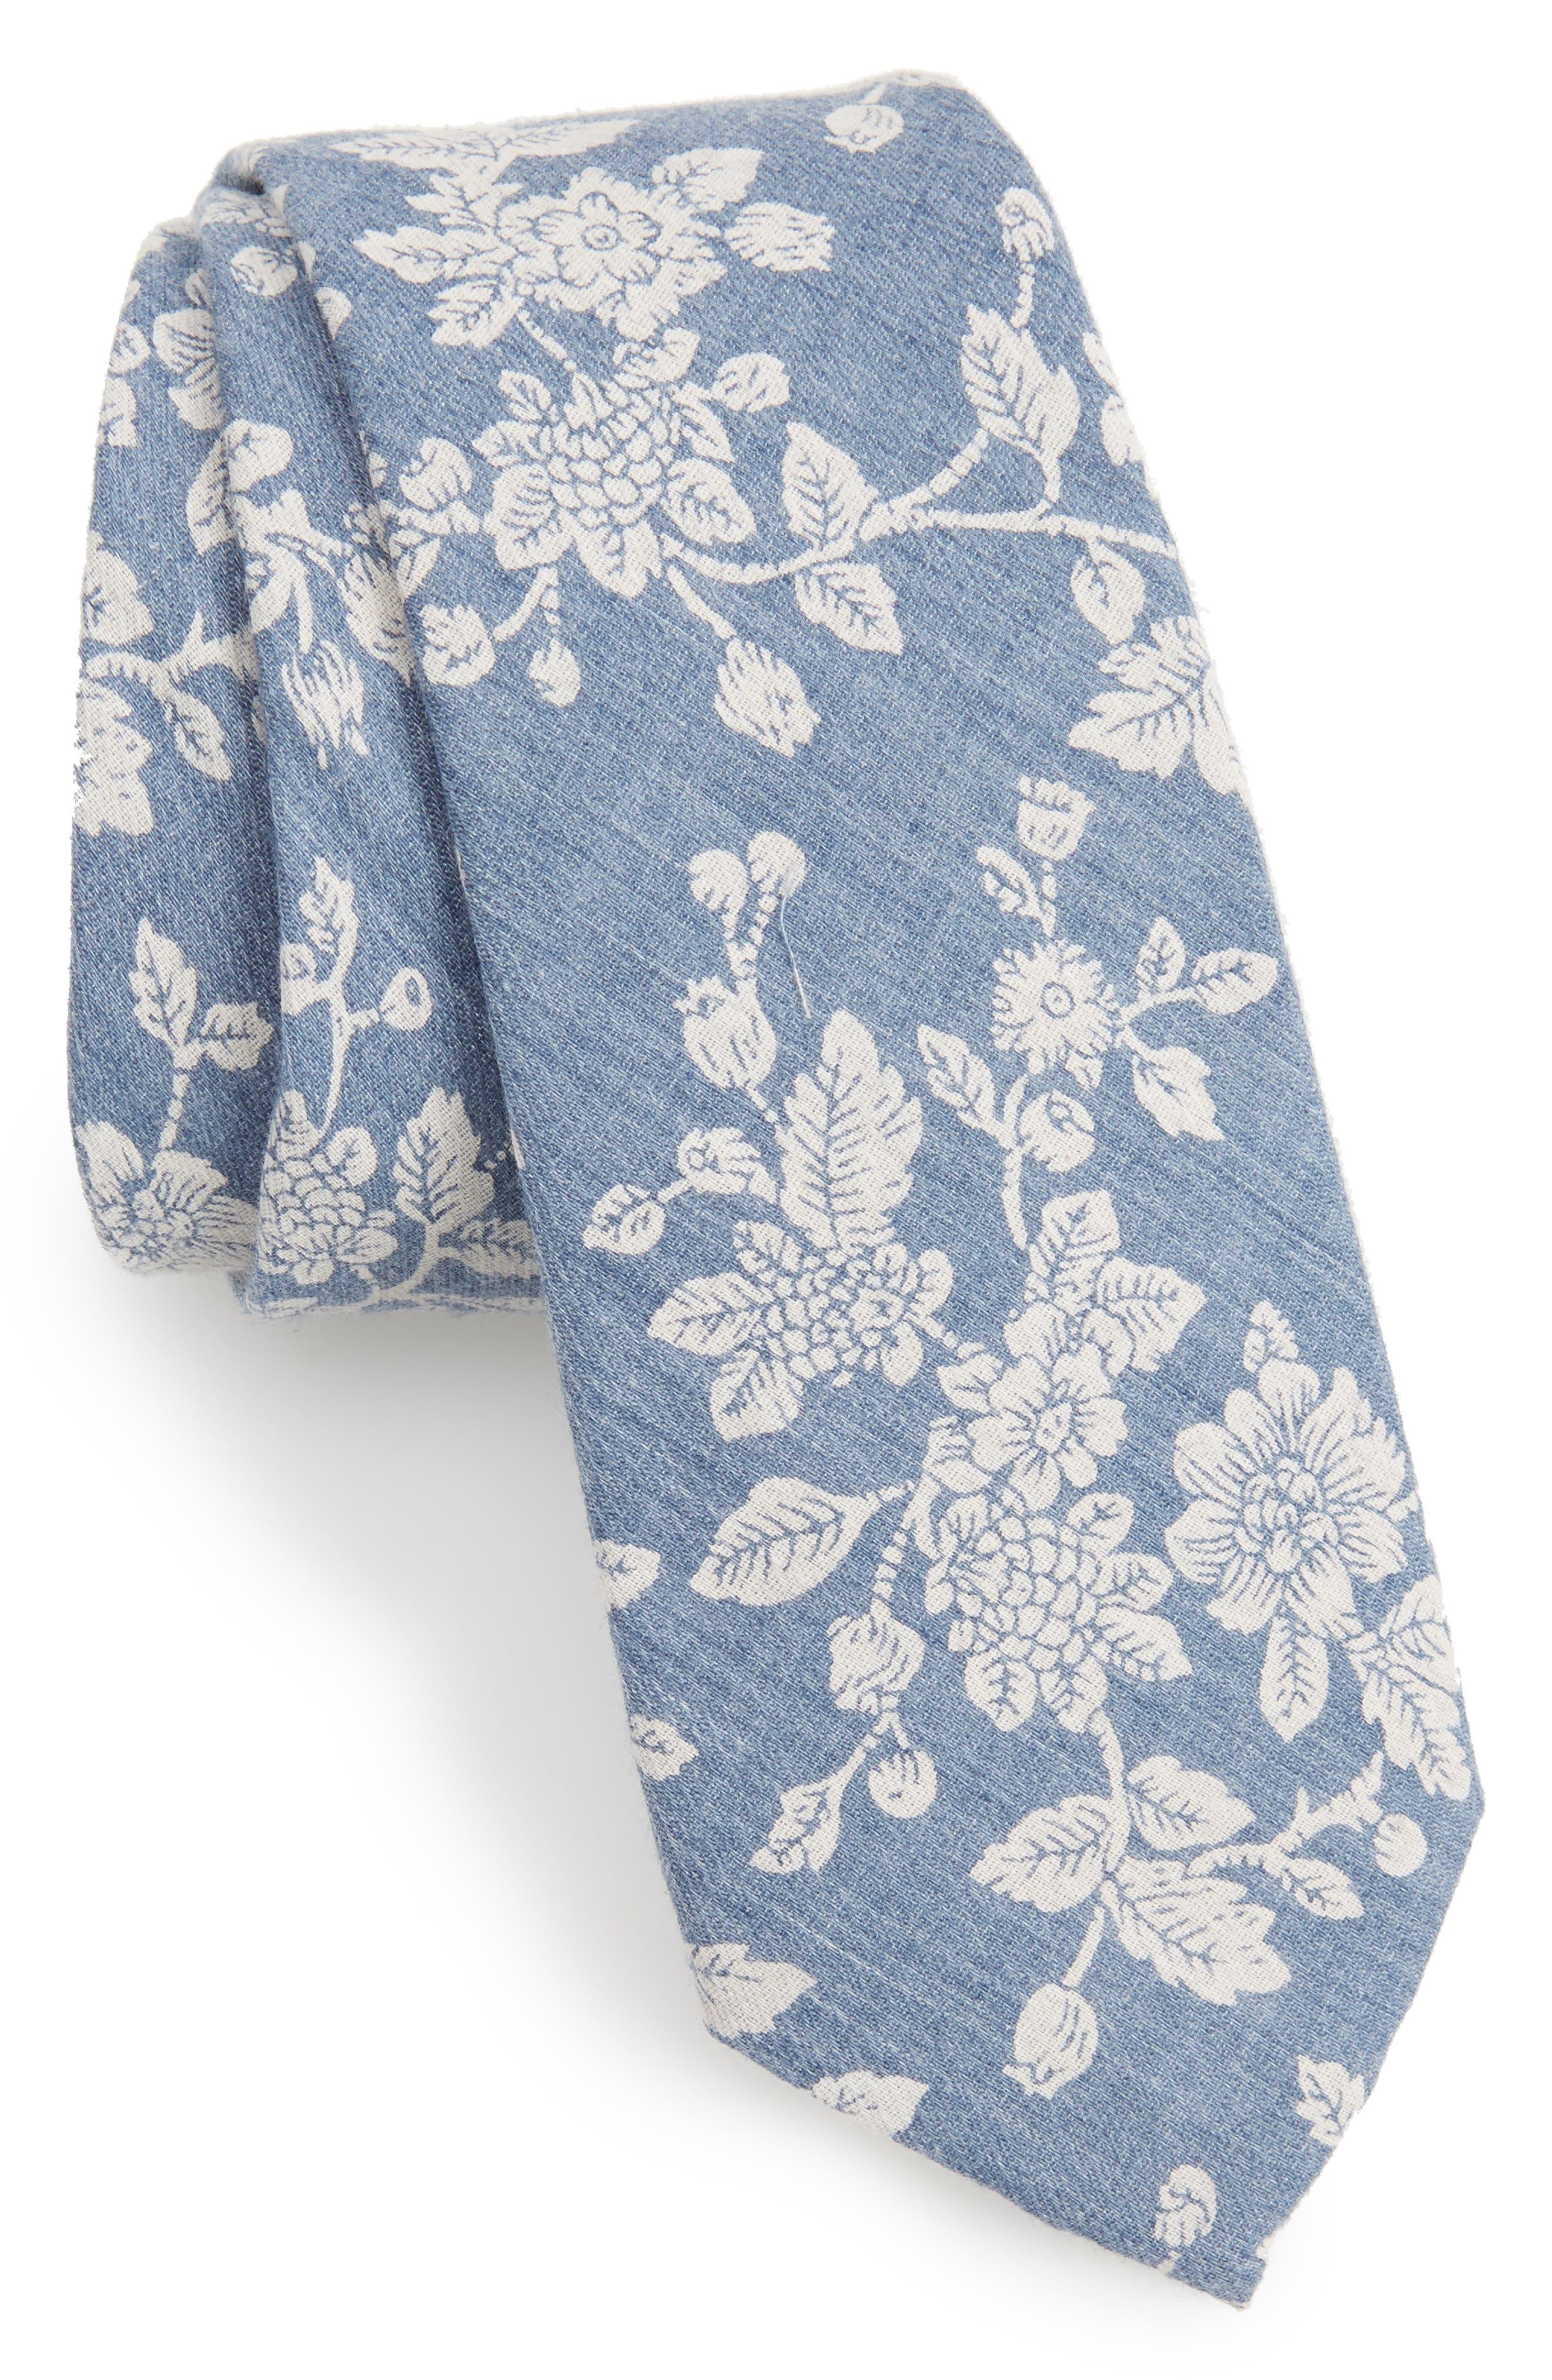 Floral Cotton Skinny Tie,                         Main,                         color, 401